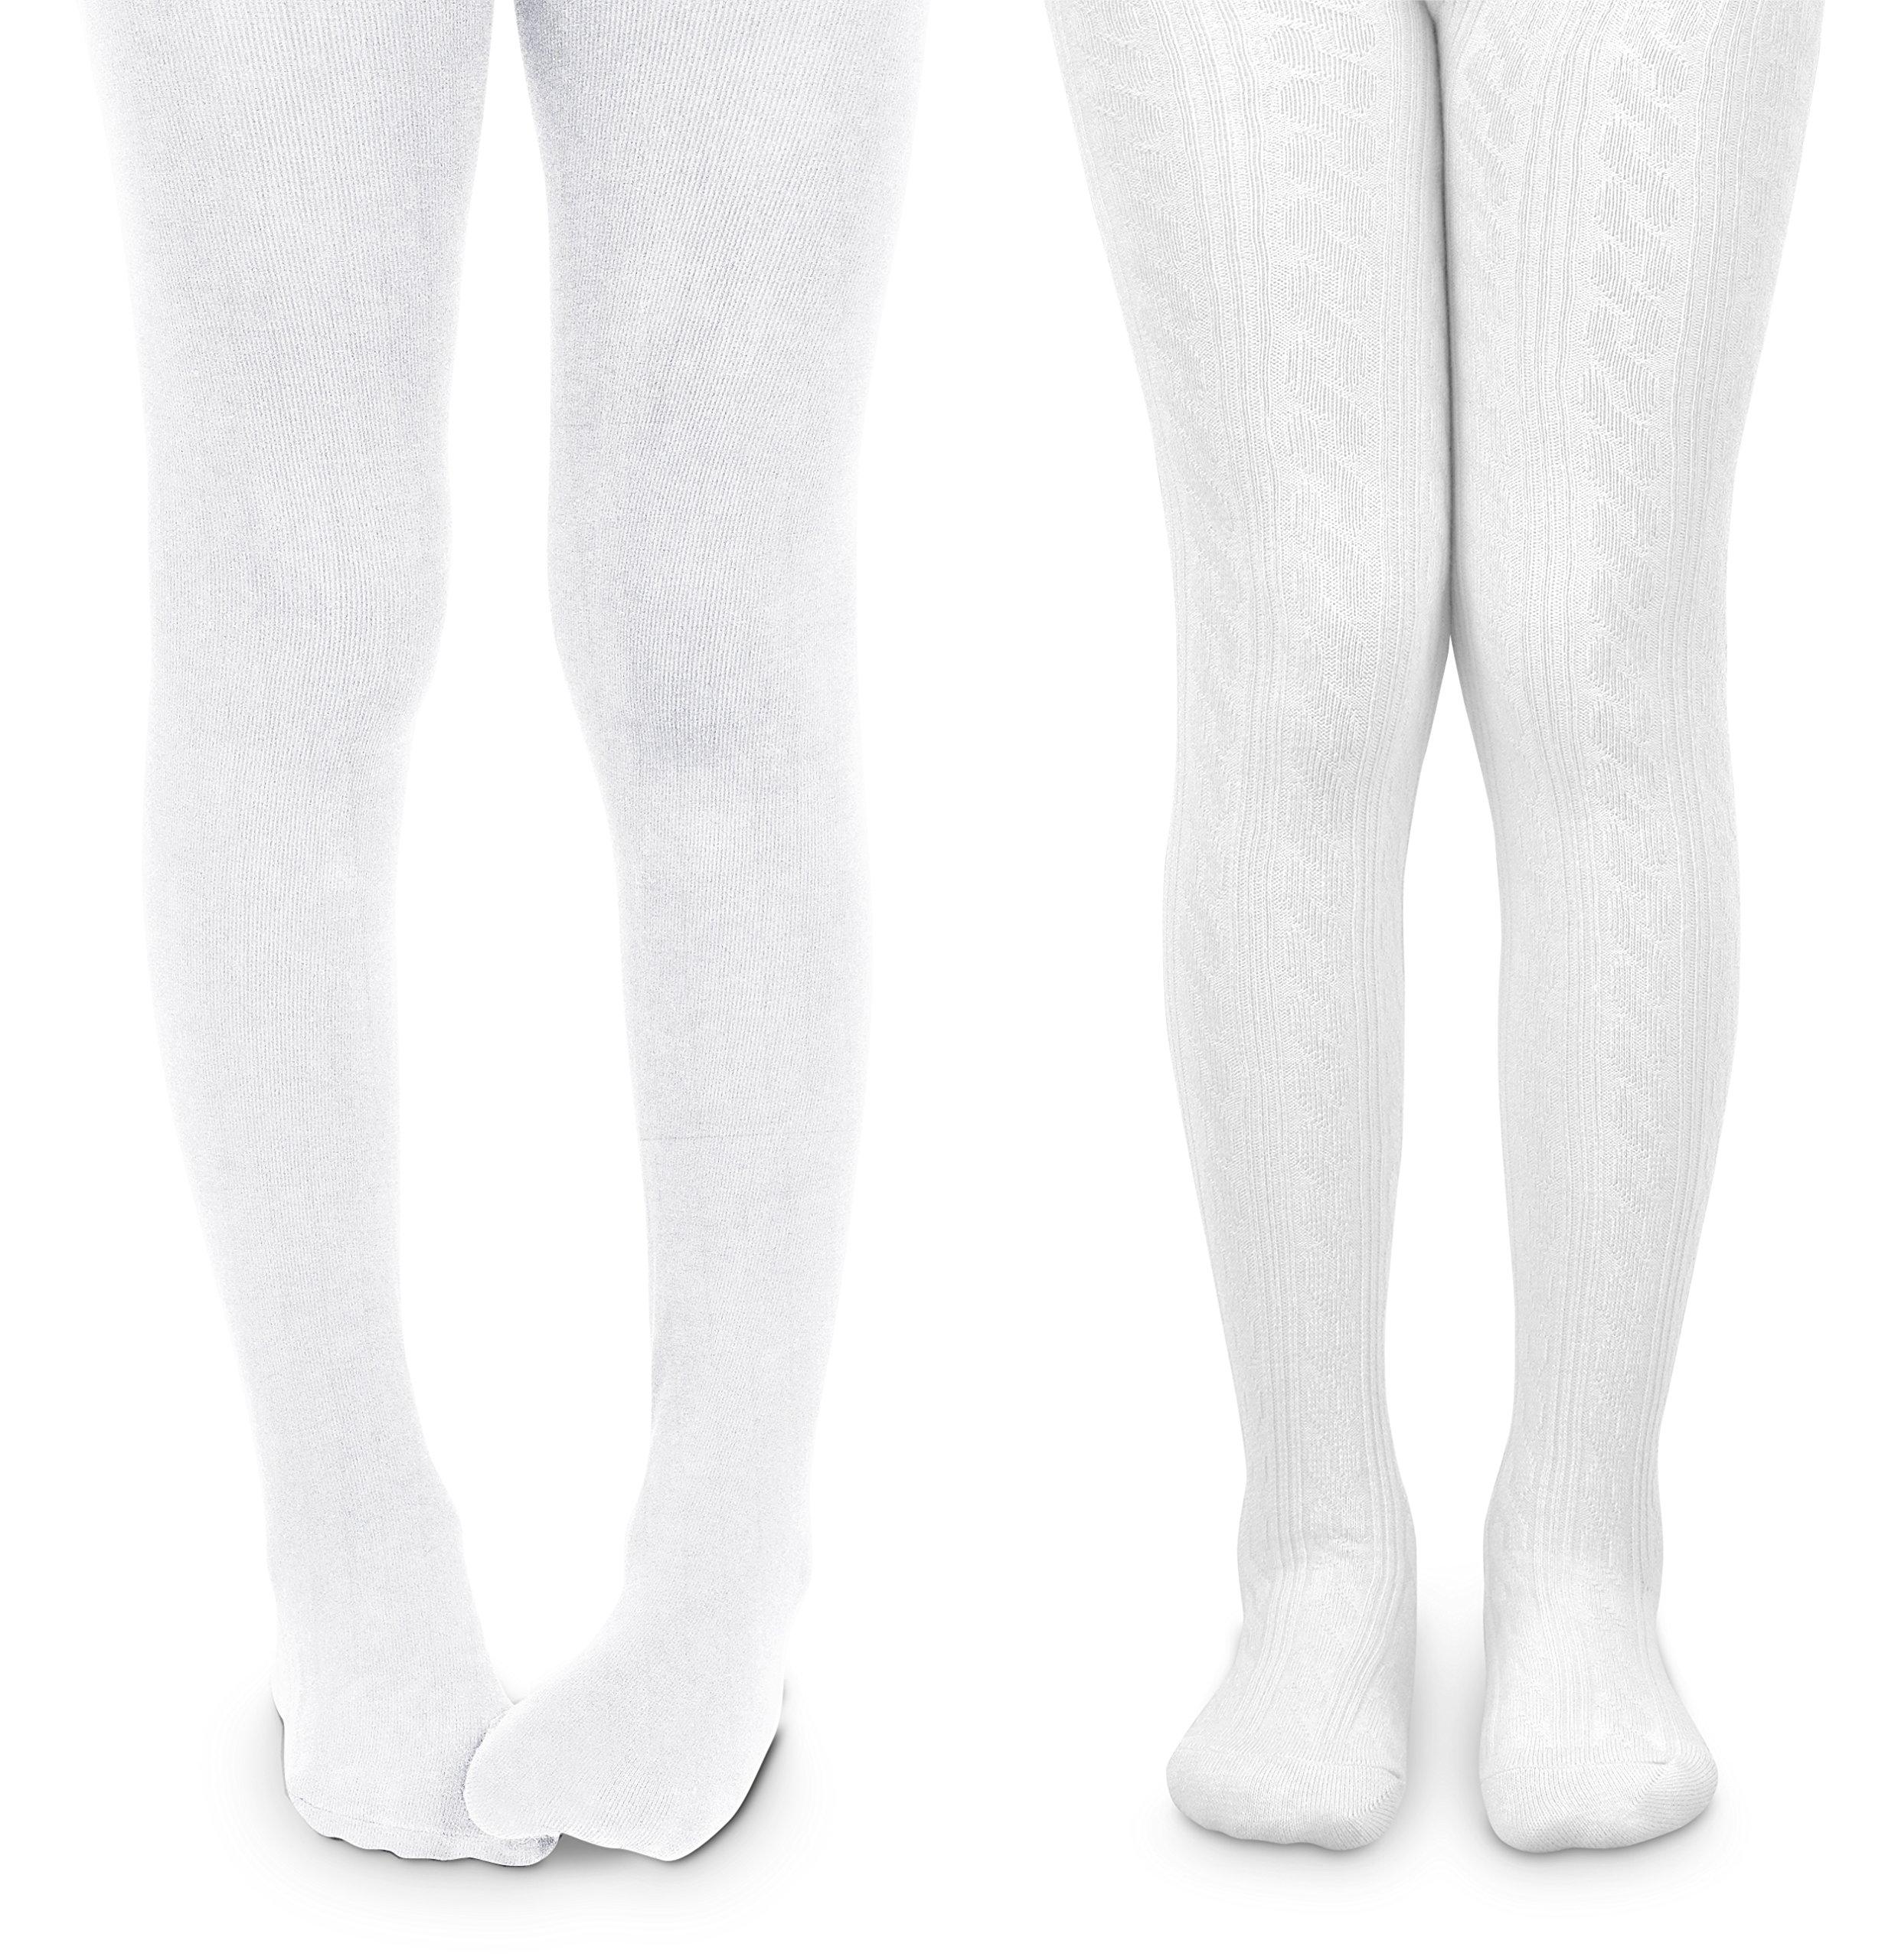 Jefferies Socks Girls School Uniform Cable & Rib Tight 2 Pack (8-10 Years, White)